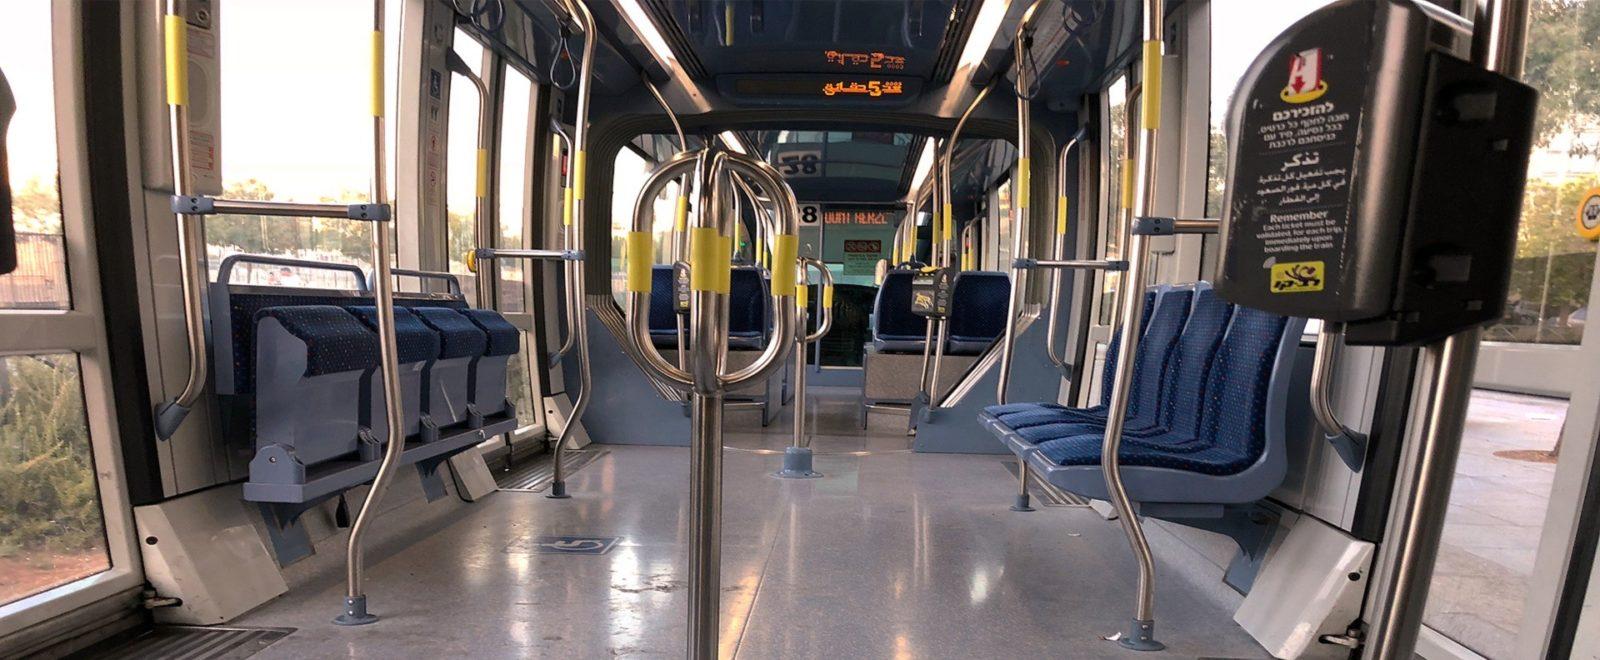 Public Transport in Jerusalem